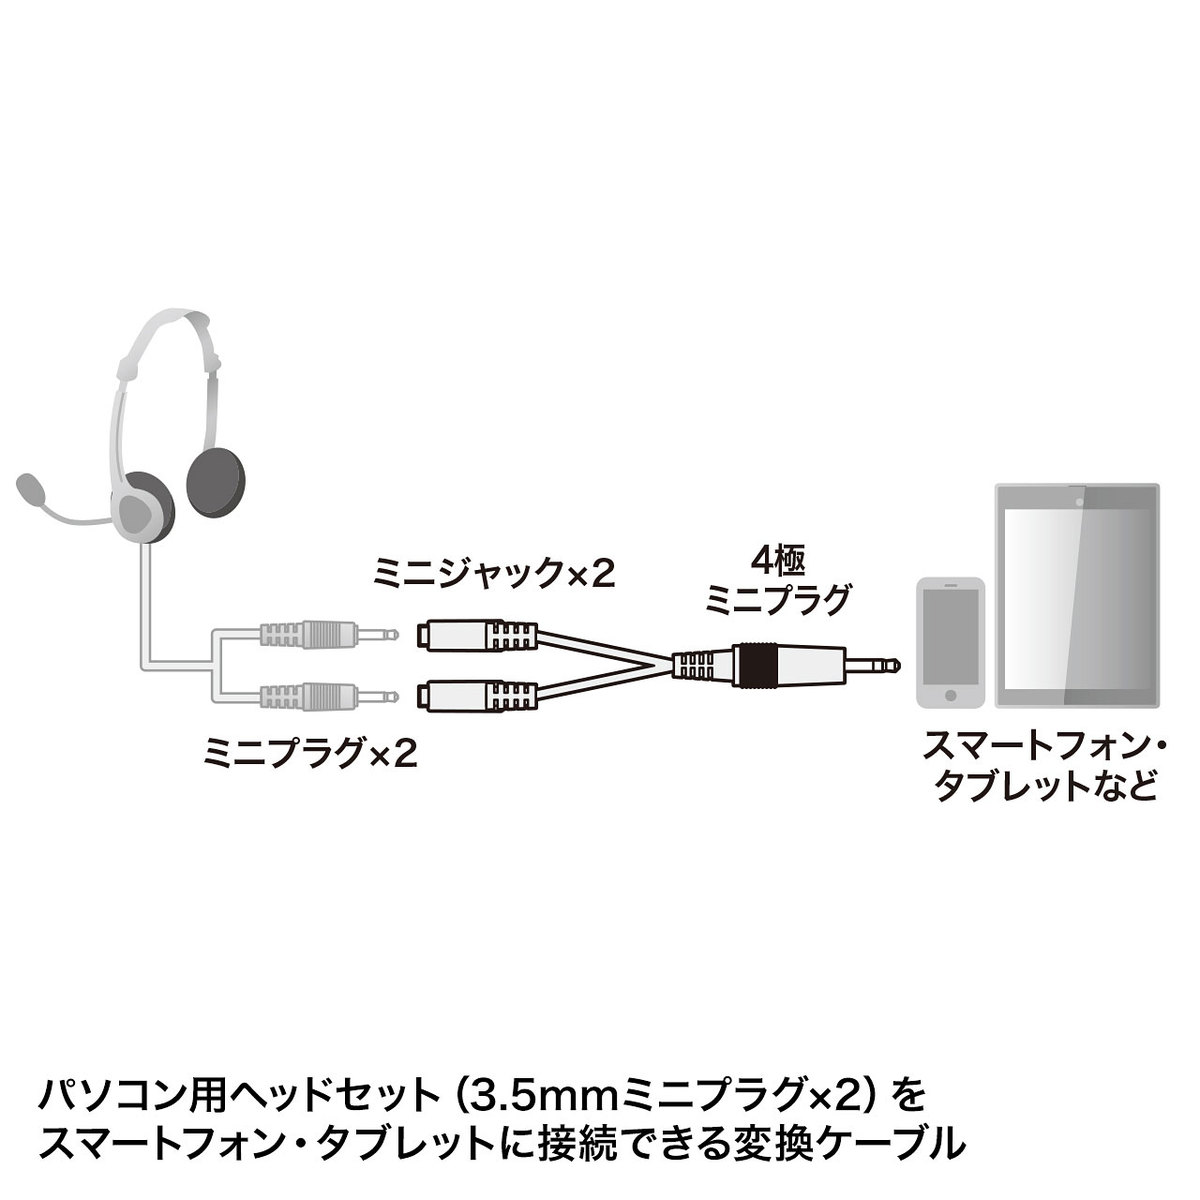 [KM-A25-005] ヘッドホン+マイク用変換アダプタケーブル(3極メスx2→4極オス)